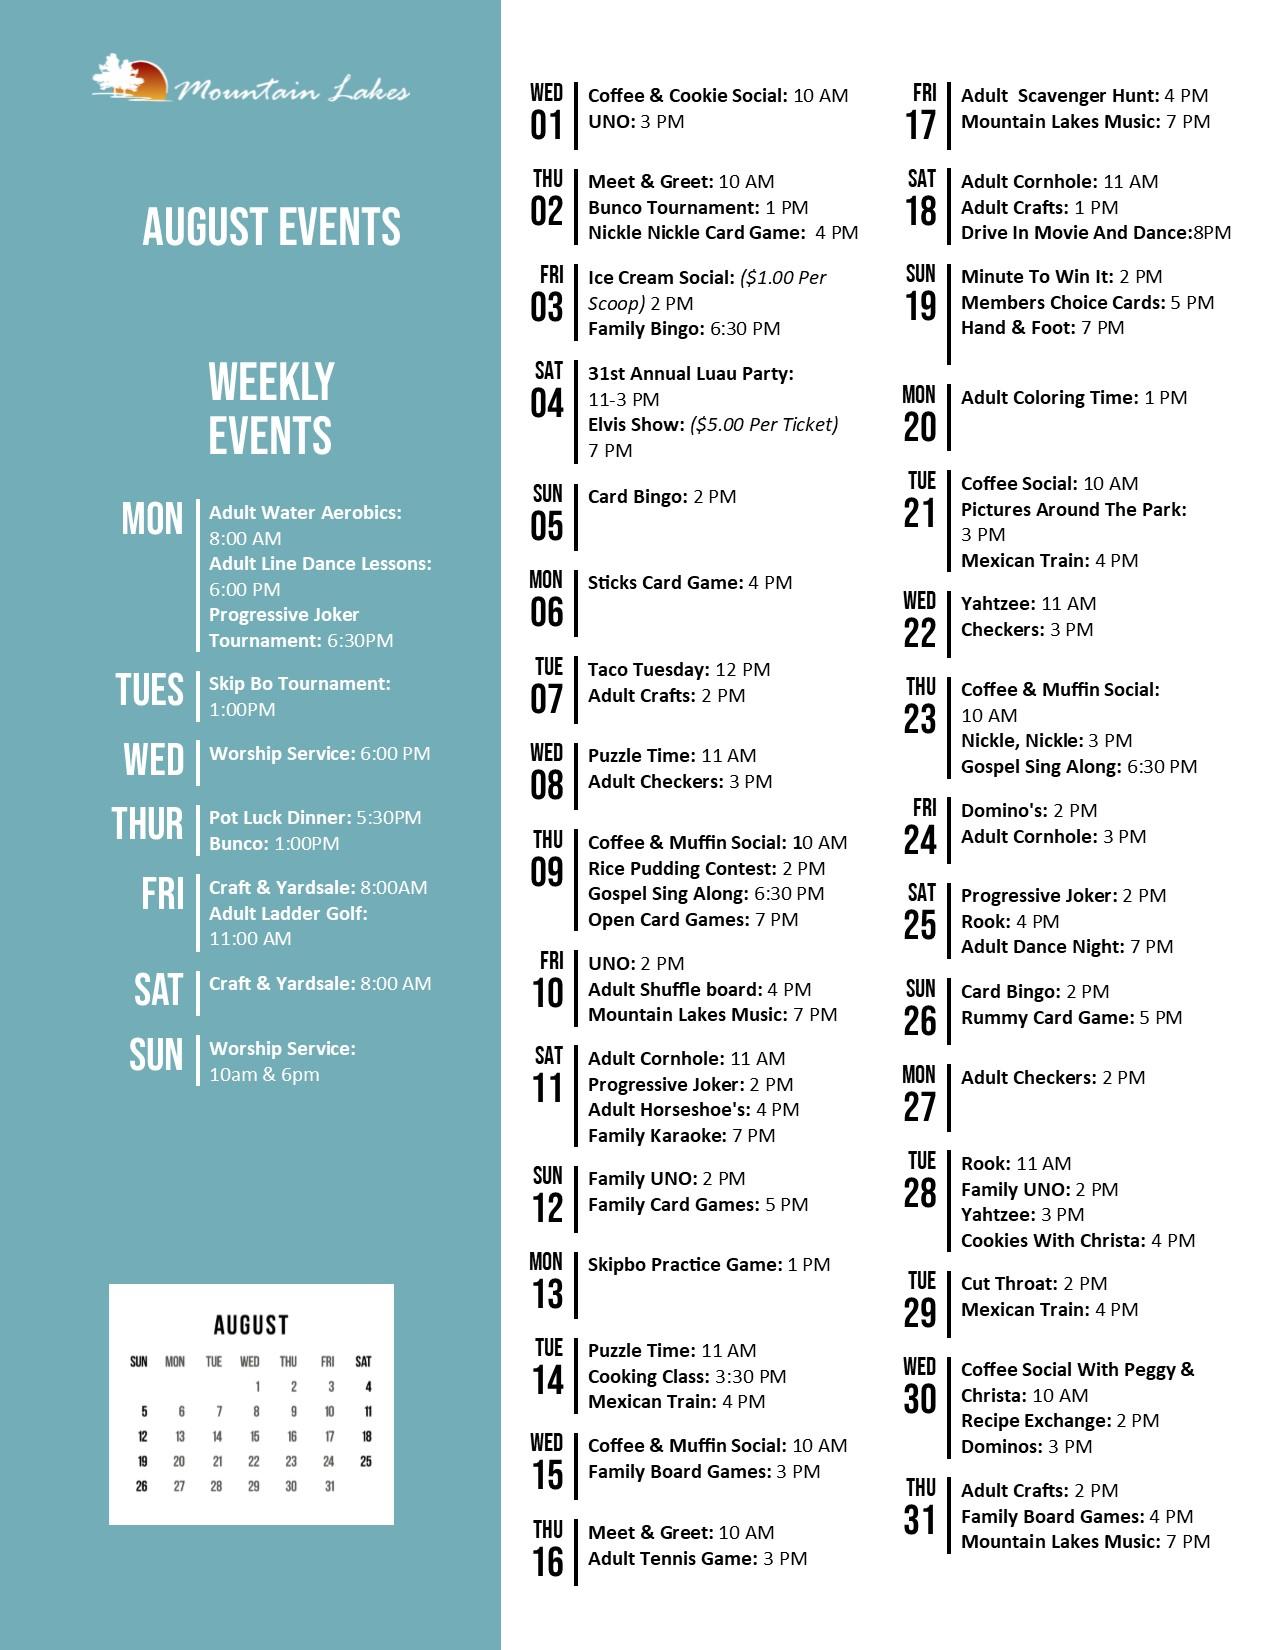 Mountain Lakes Activity Calendar August 2018